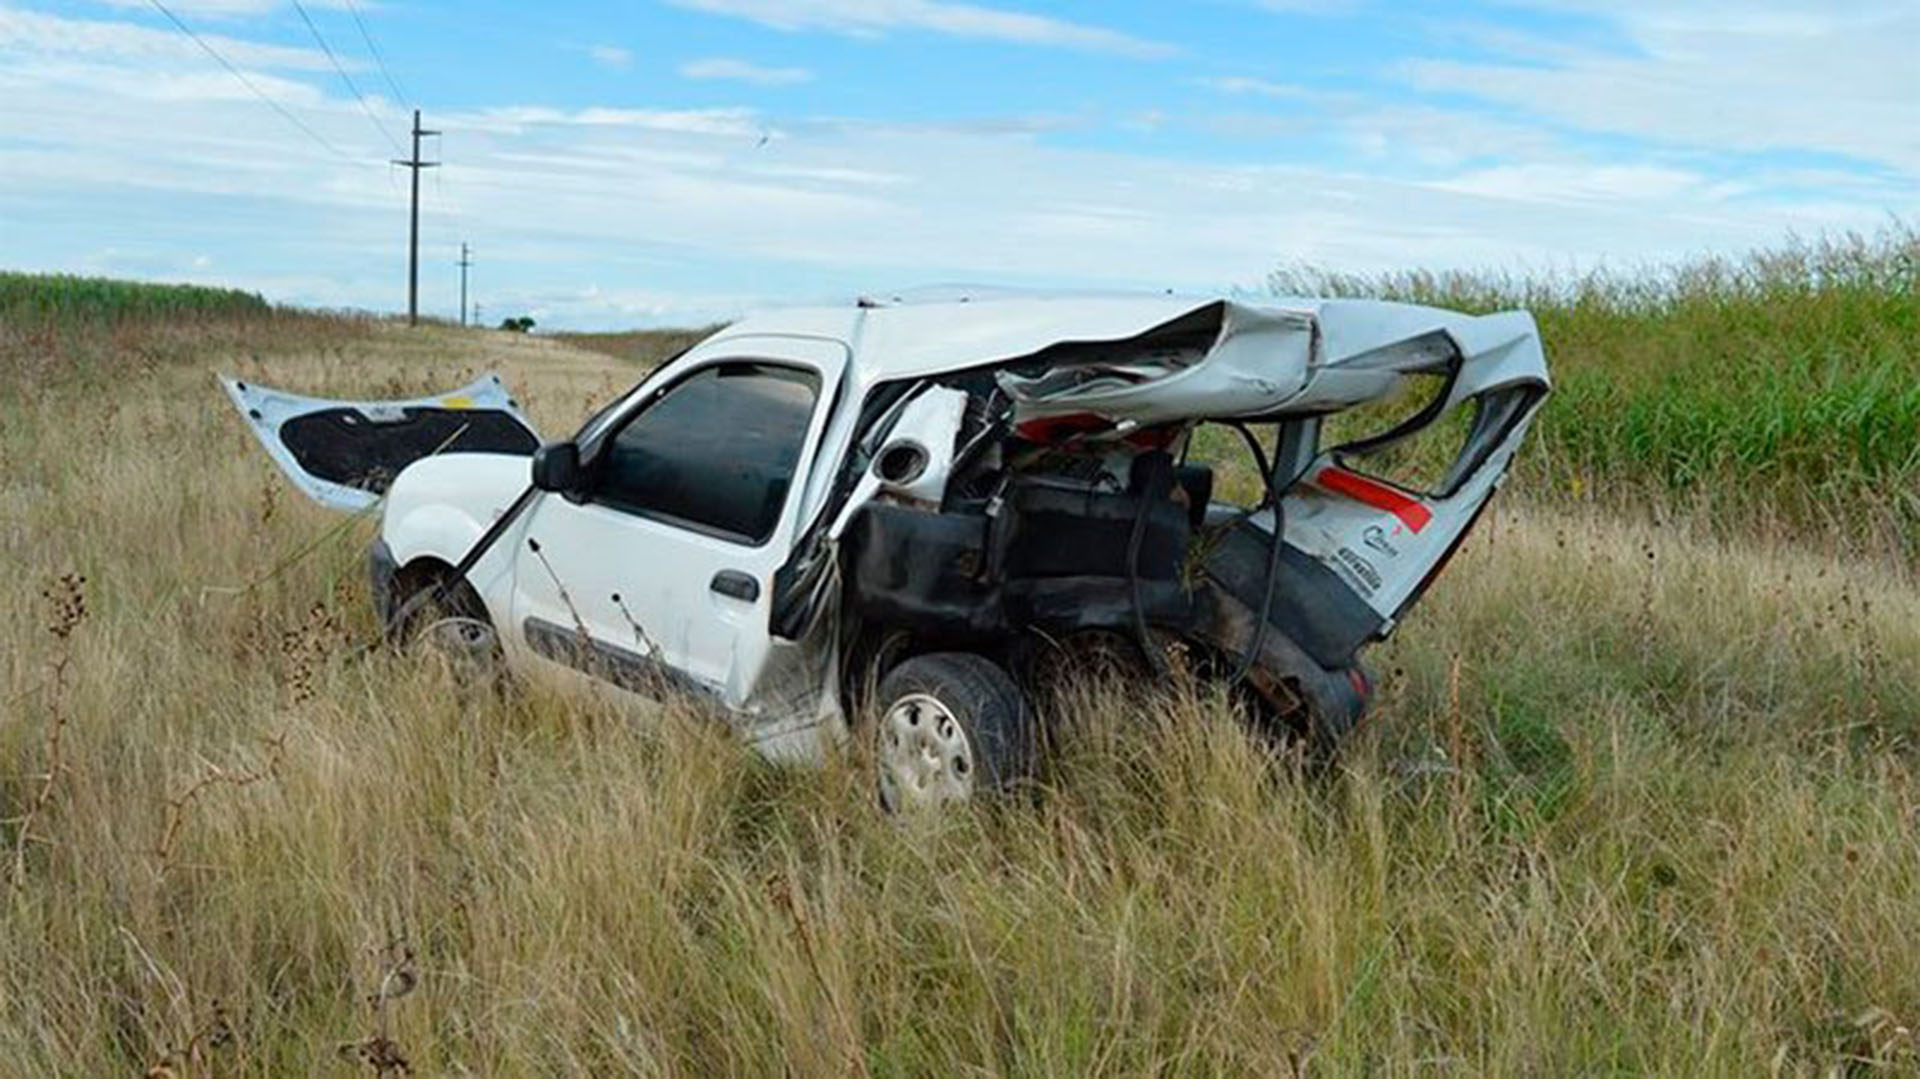 La Kangoo de la víctima fatal del accidente (@aleginart)